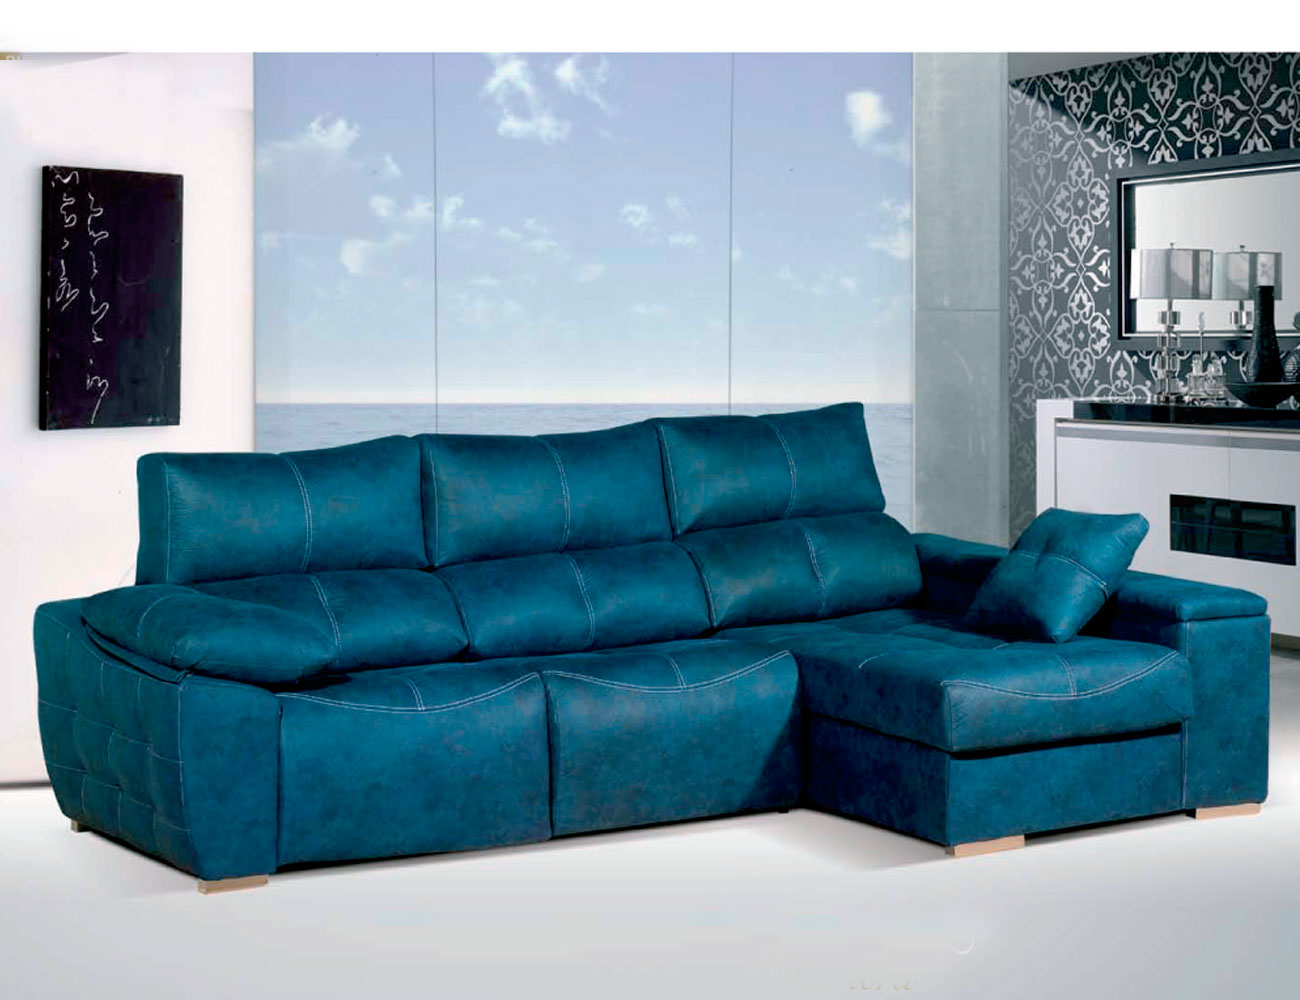 Sofa chaiselongue relax 2 motores anti manchas turquesa34